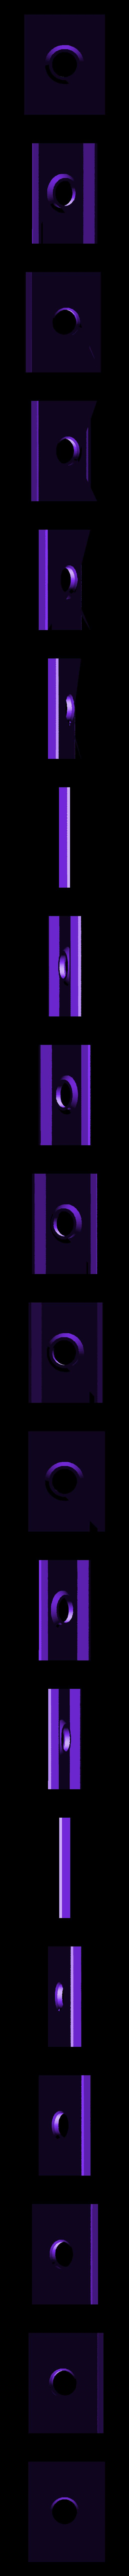 CSS-crank-cover.stl Download free STL file Hand Crank Solder Dispenser • 3D printable design, Adafruit